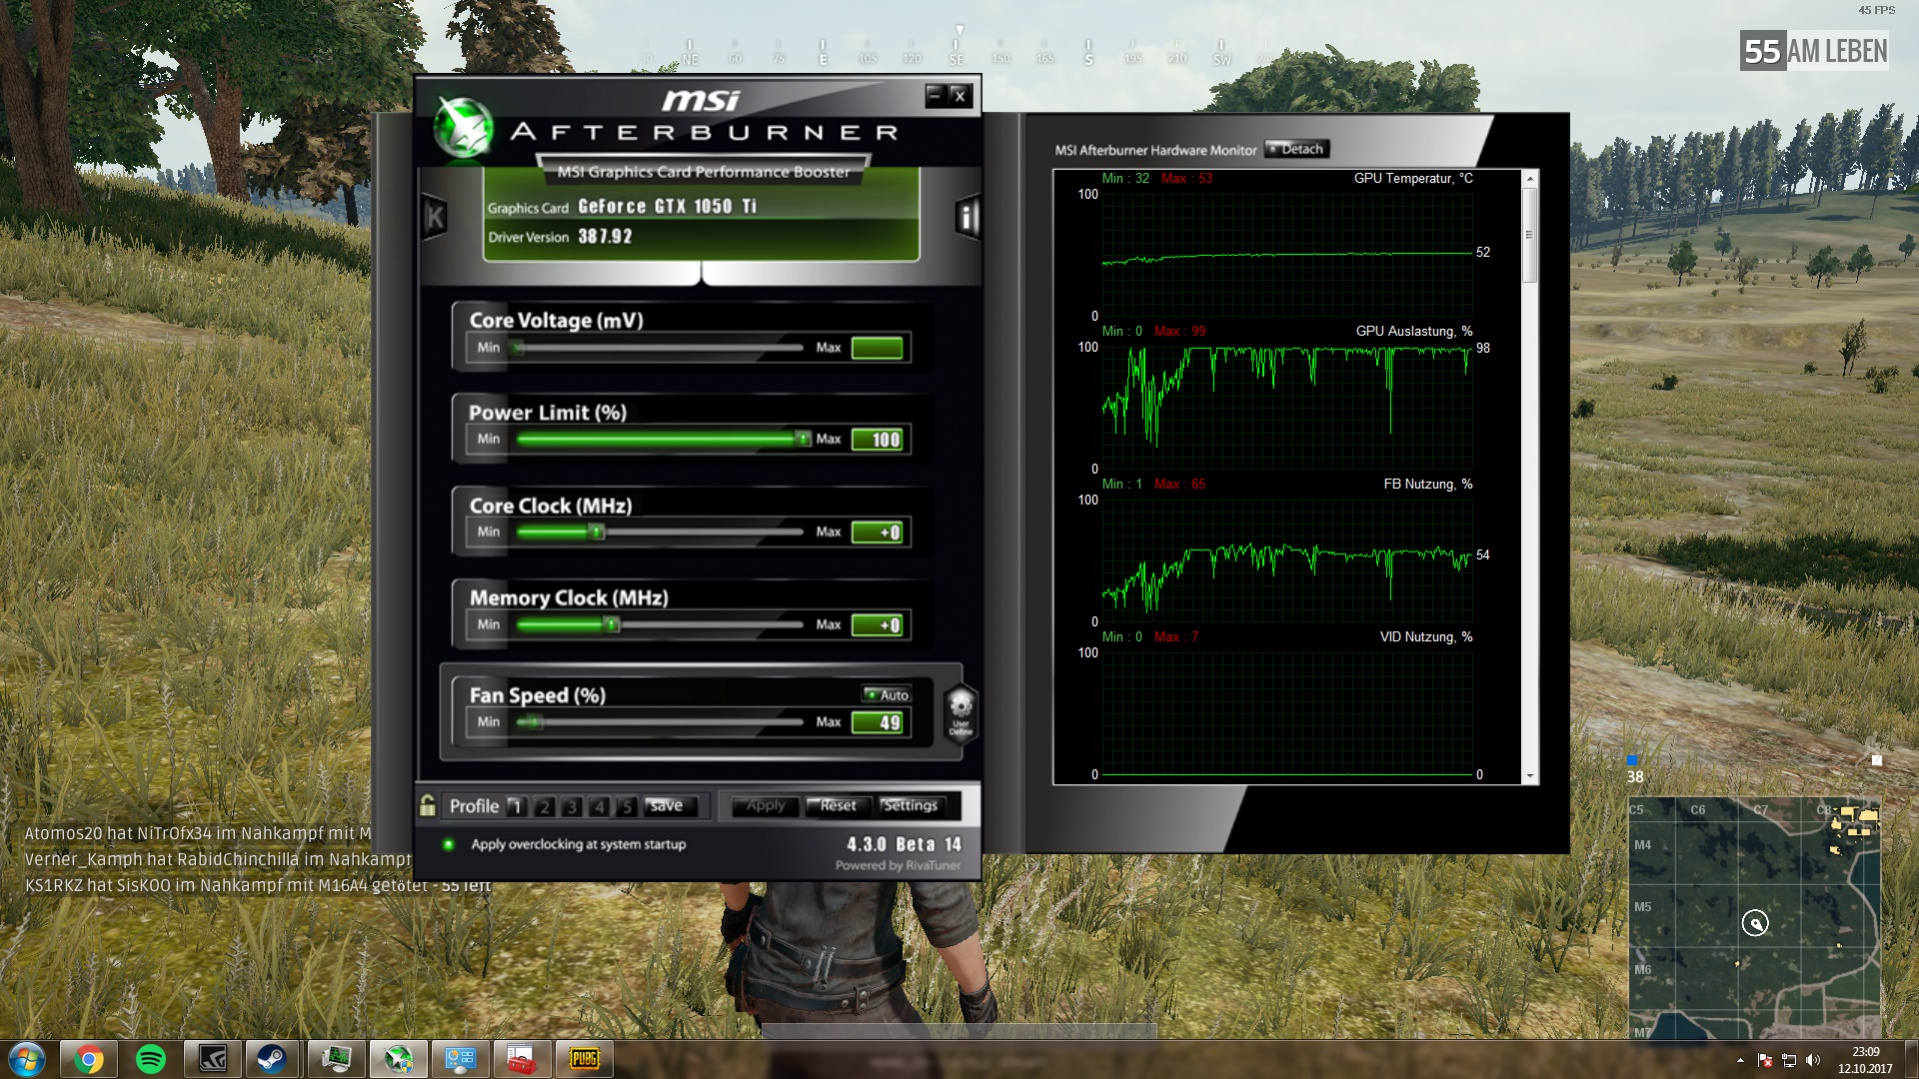 NVIDIA GeForce GTX 1050 Ti und trotzdem niedrige fps